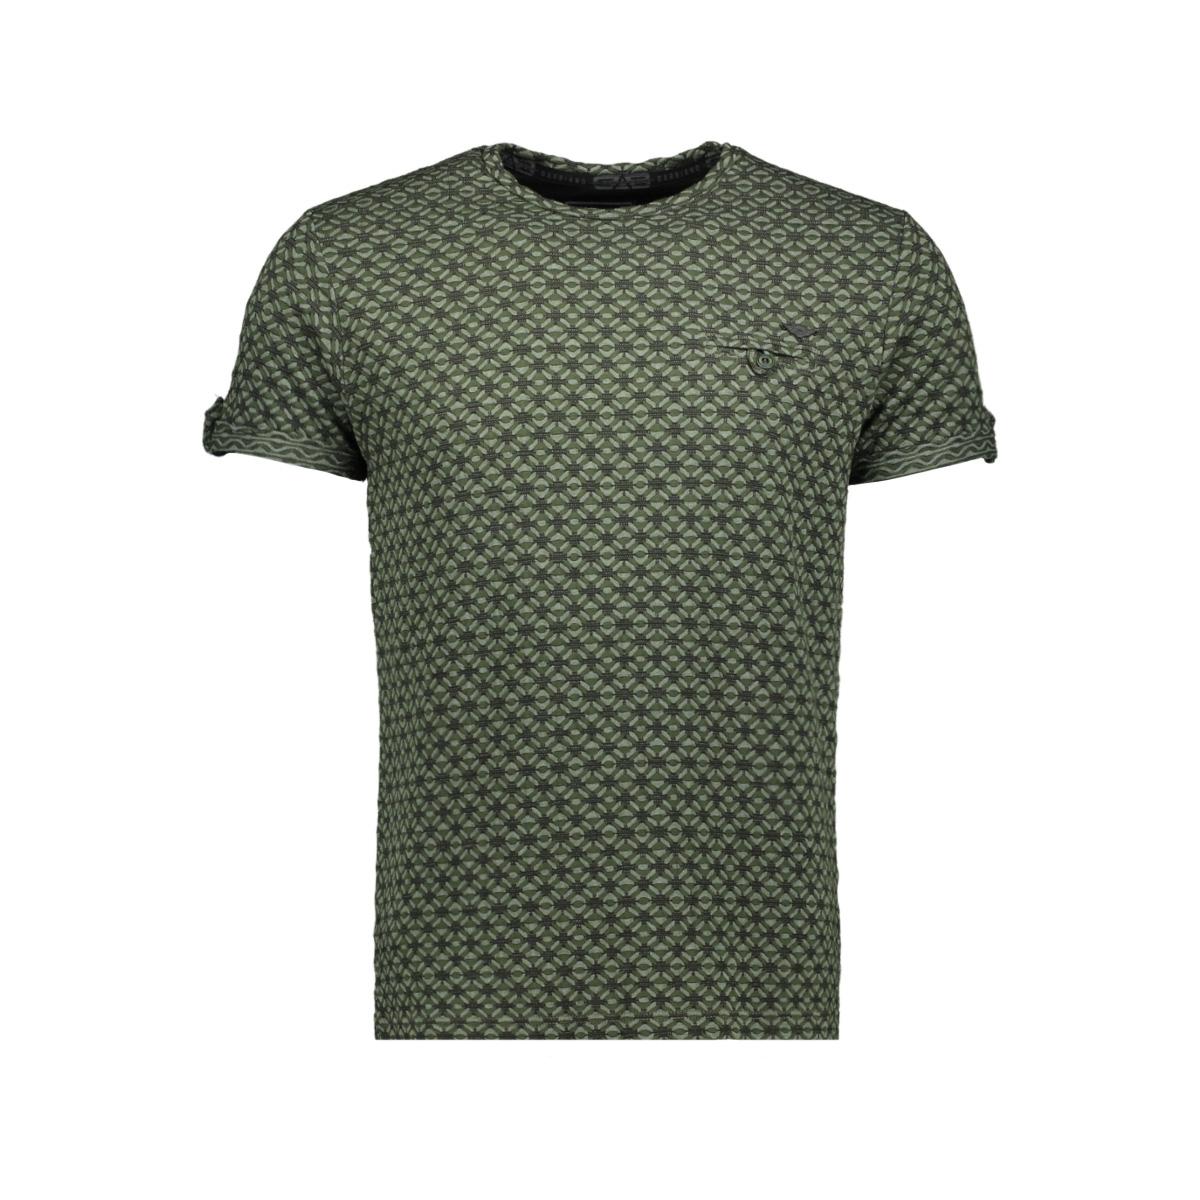 shortsleeve t shirt 15172 gabbiano t-shirt army